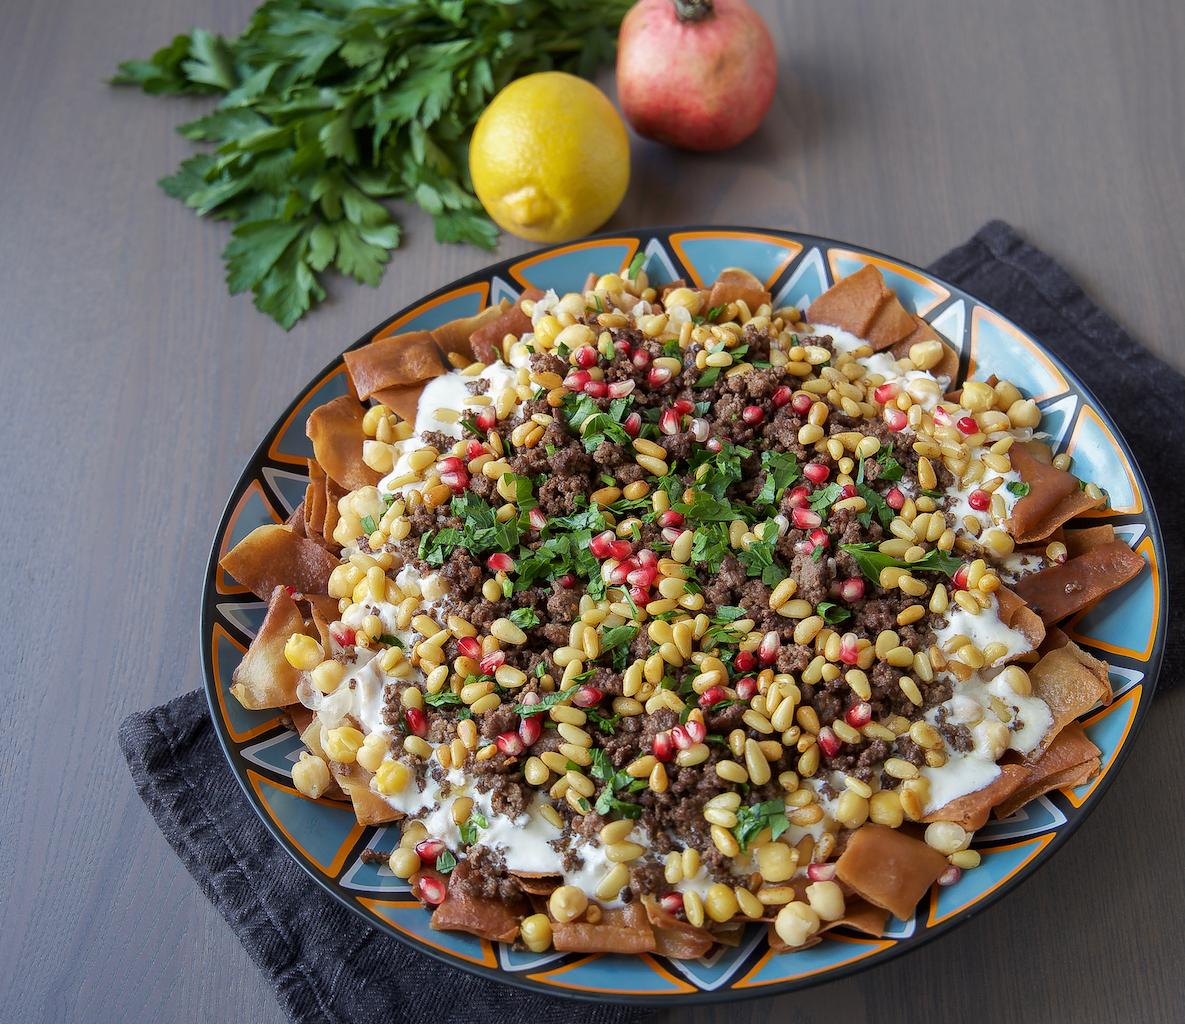 syrisk mat recept